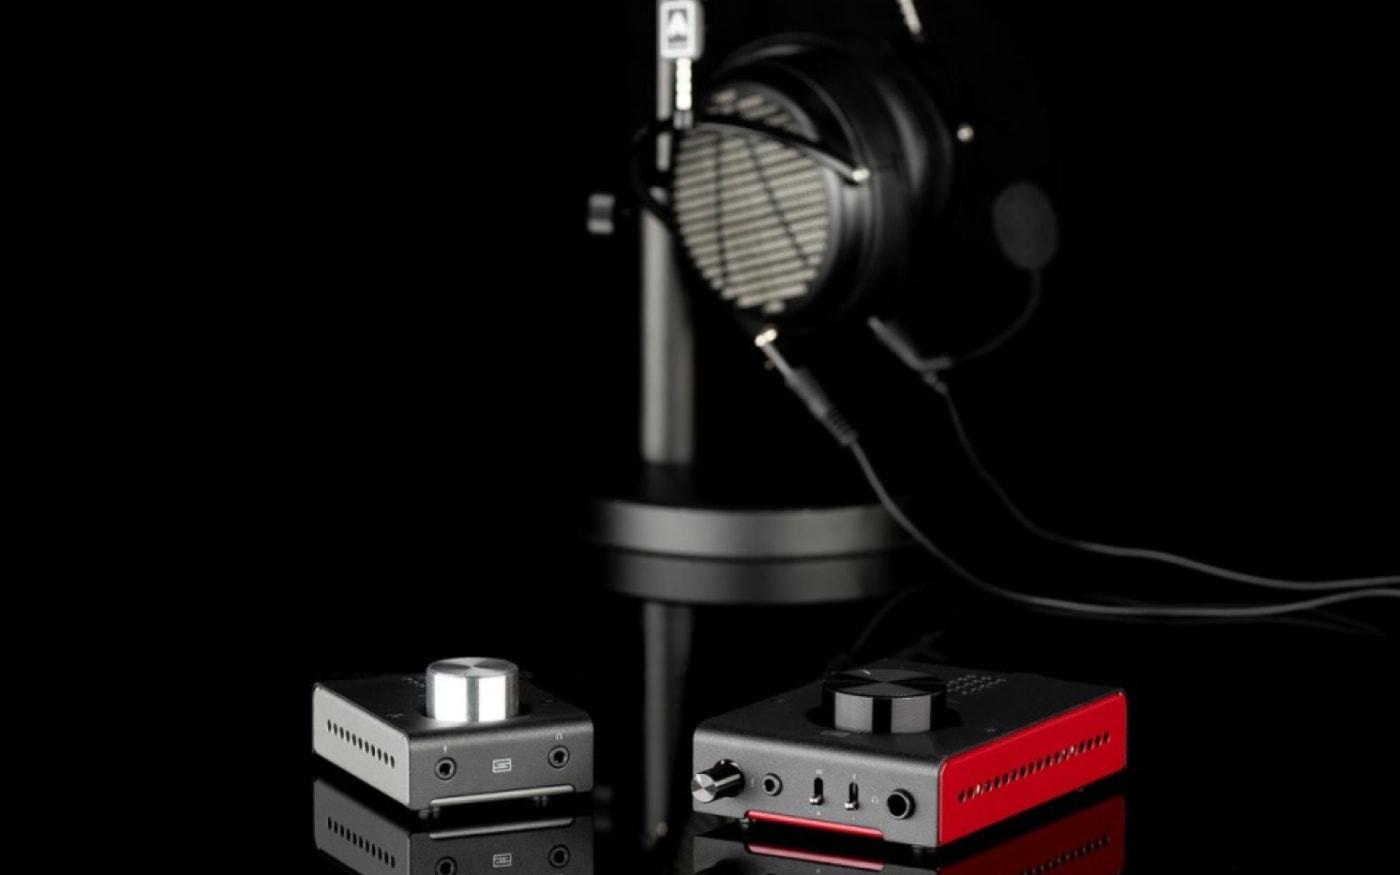 [Schiit Audio] Empresa lança dois novos DAC/amps voltados para o público gamer